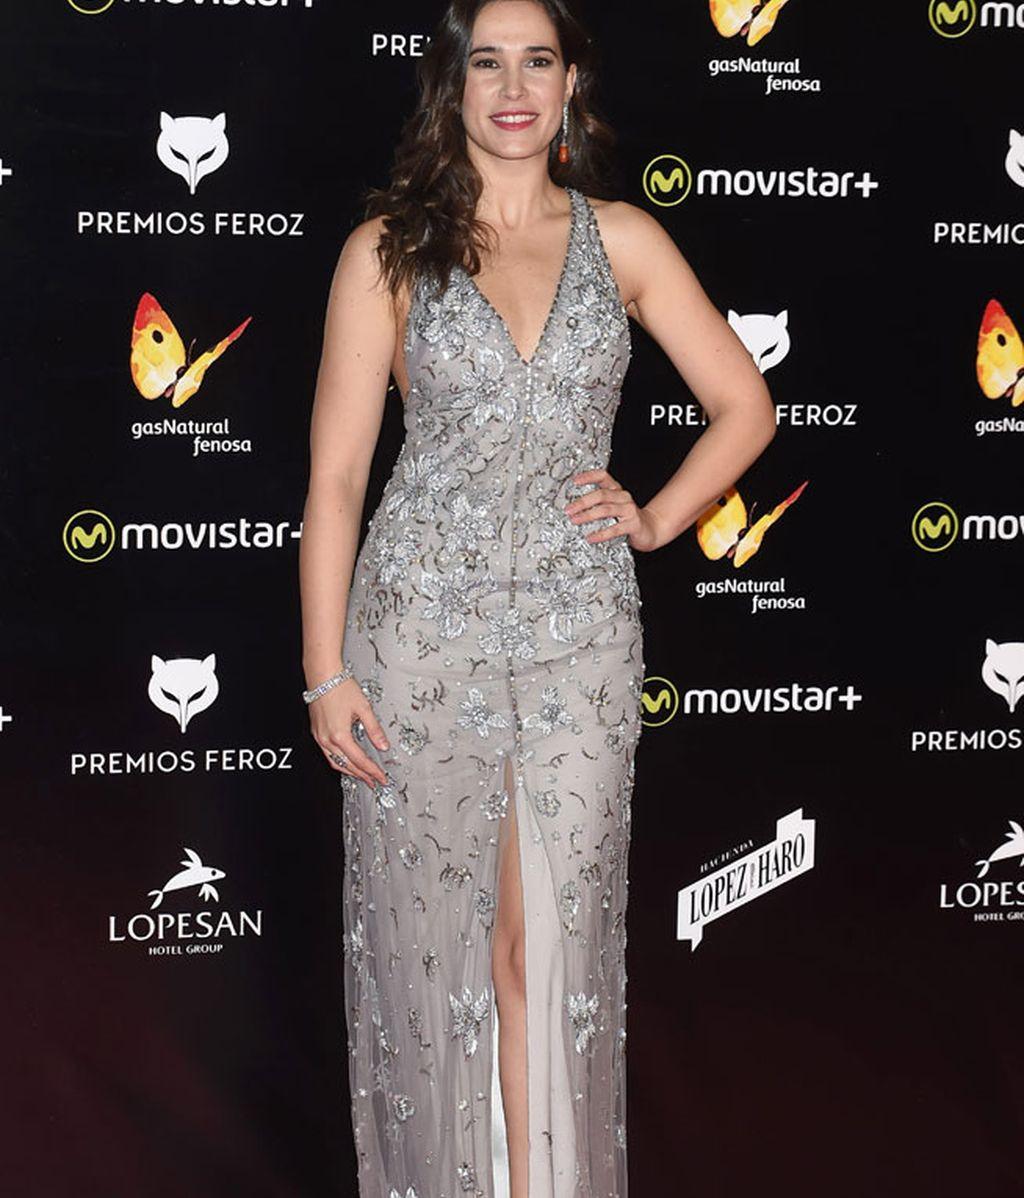 Celia Freijeiro vestida de gris con pedrería